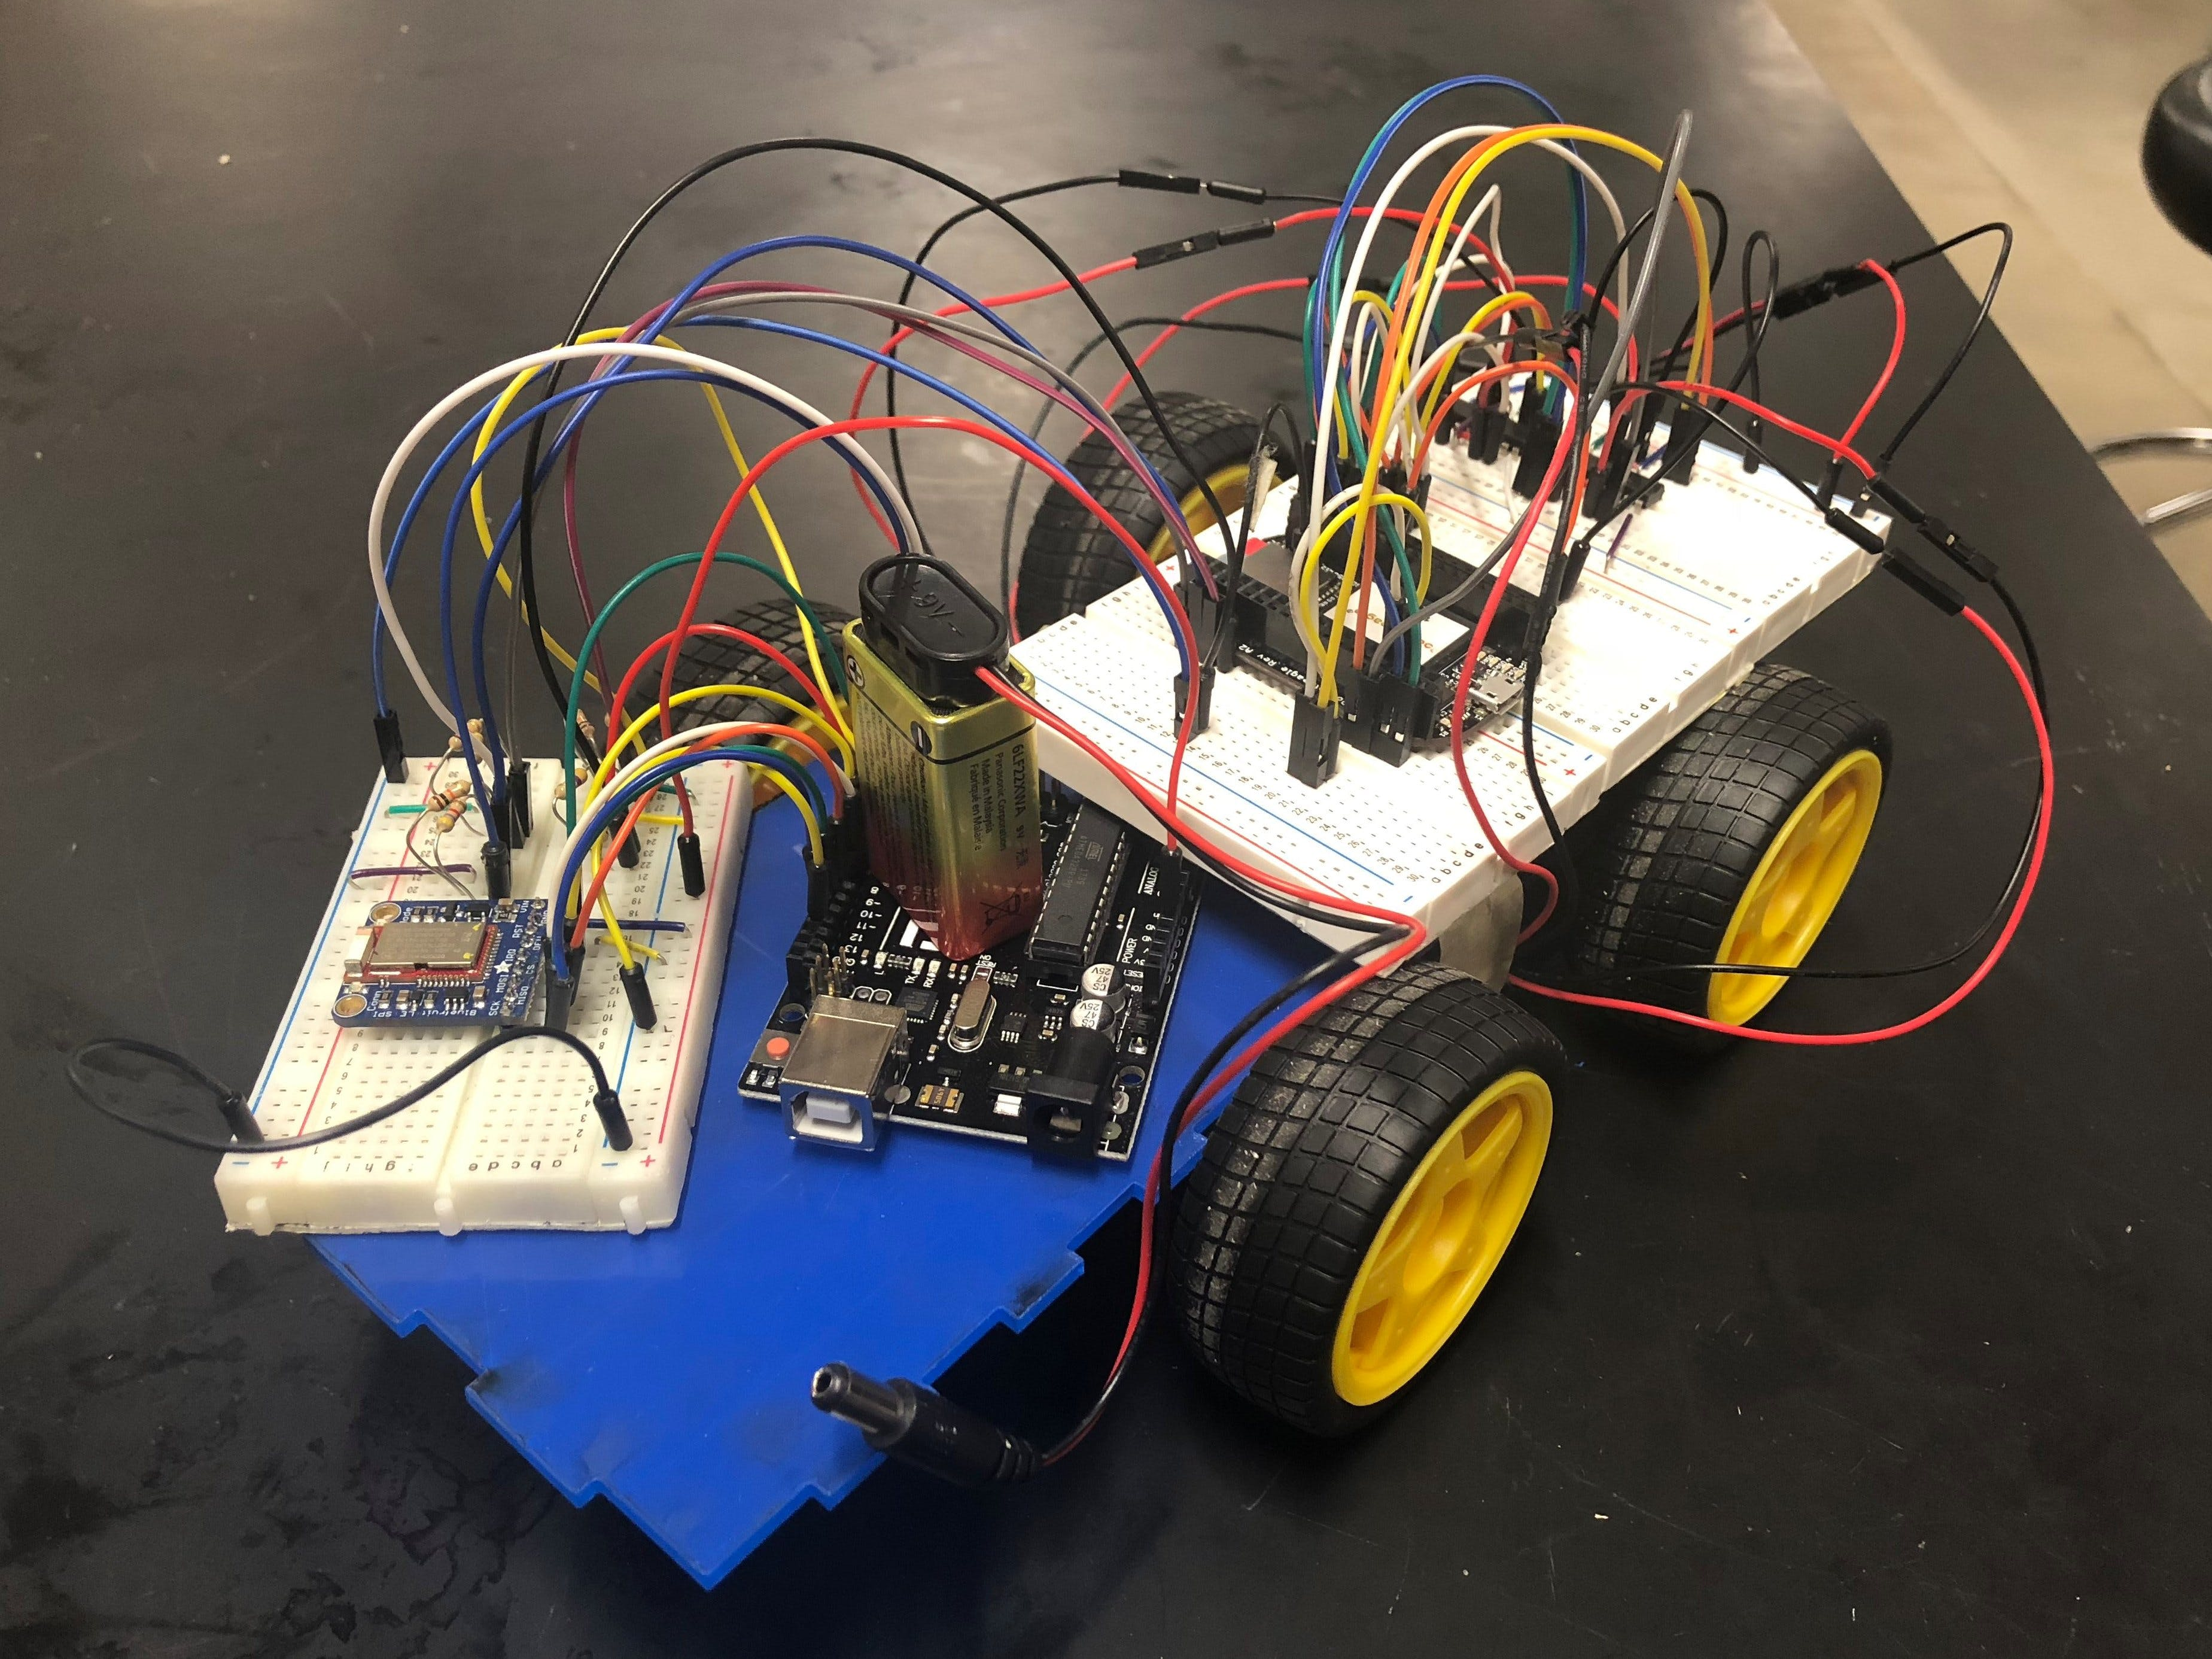 Remote Control Car w/ PocketBeagle and Arduino